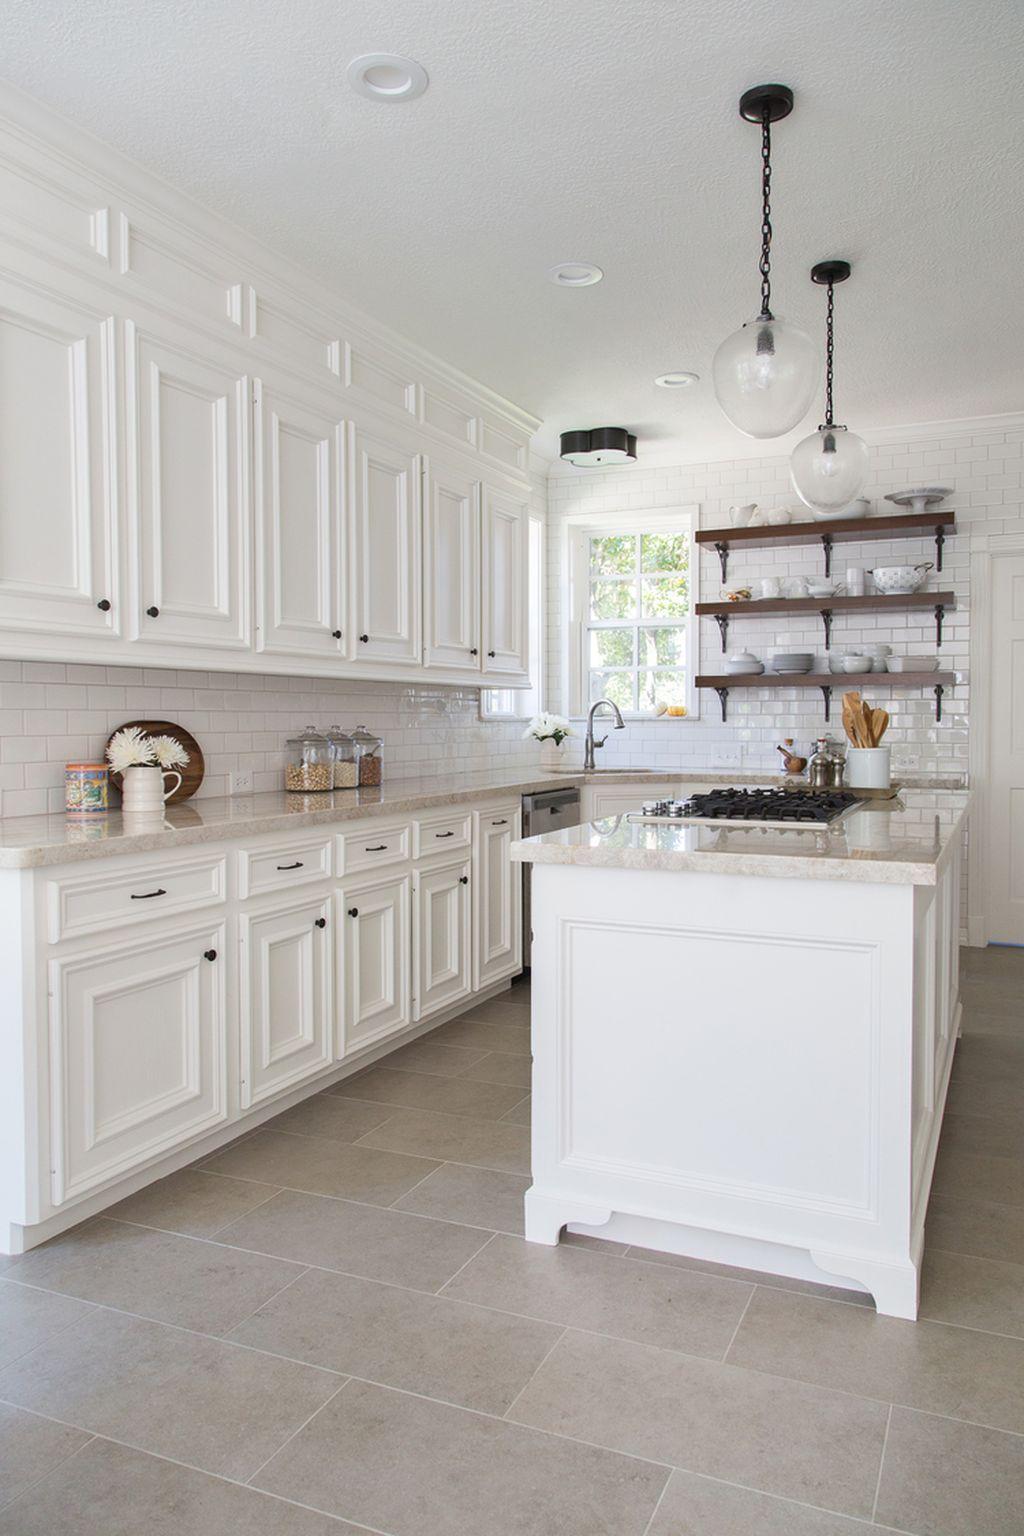 Cool 40 Outstanding Porcelain Tile Kitchen Floors Ideas More At Https Trendecor Co 2017 08 28